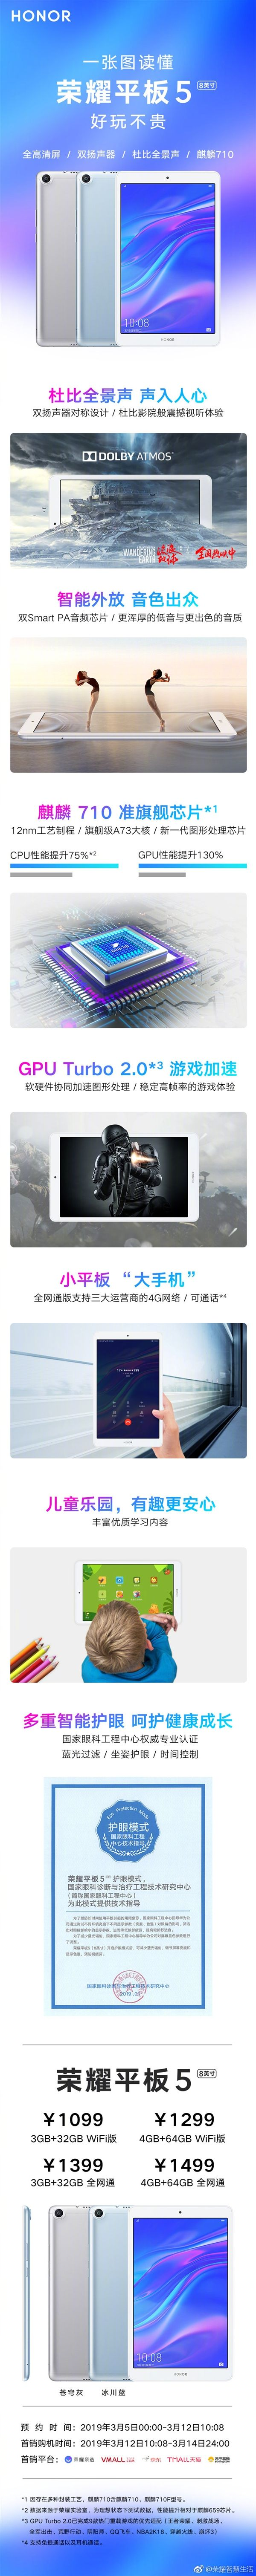 Представлен планшет Honor Tab 5 с чипом Kirin 710 – фото 2